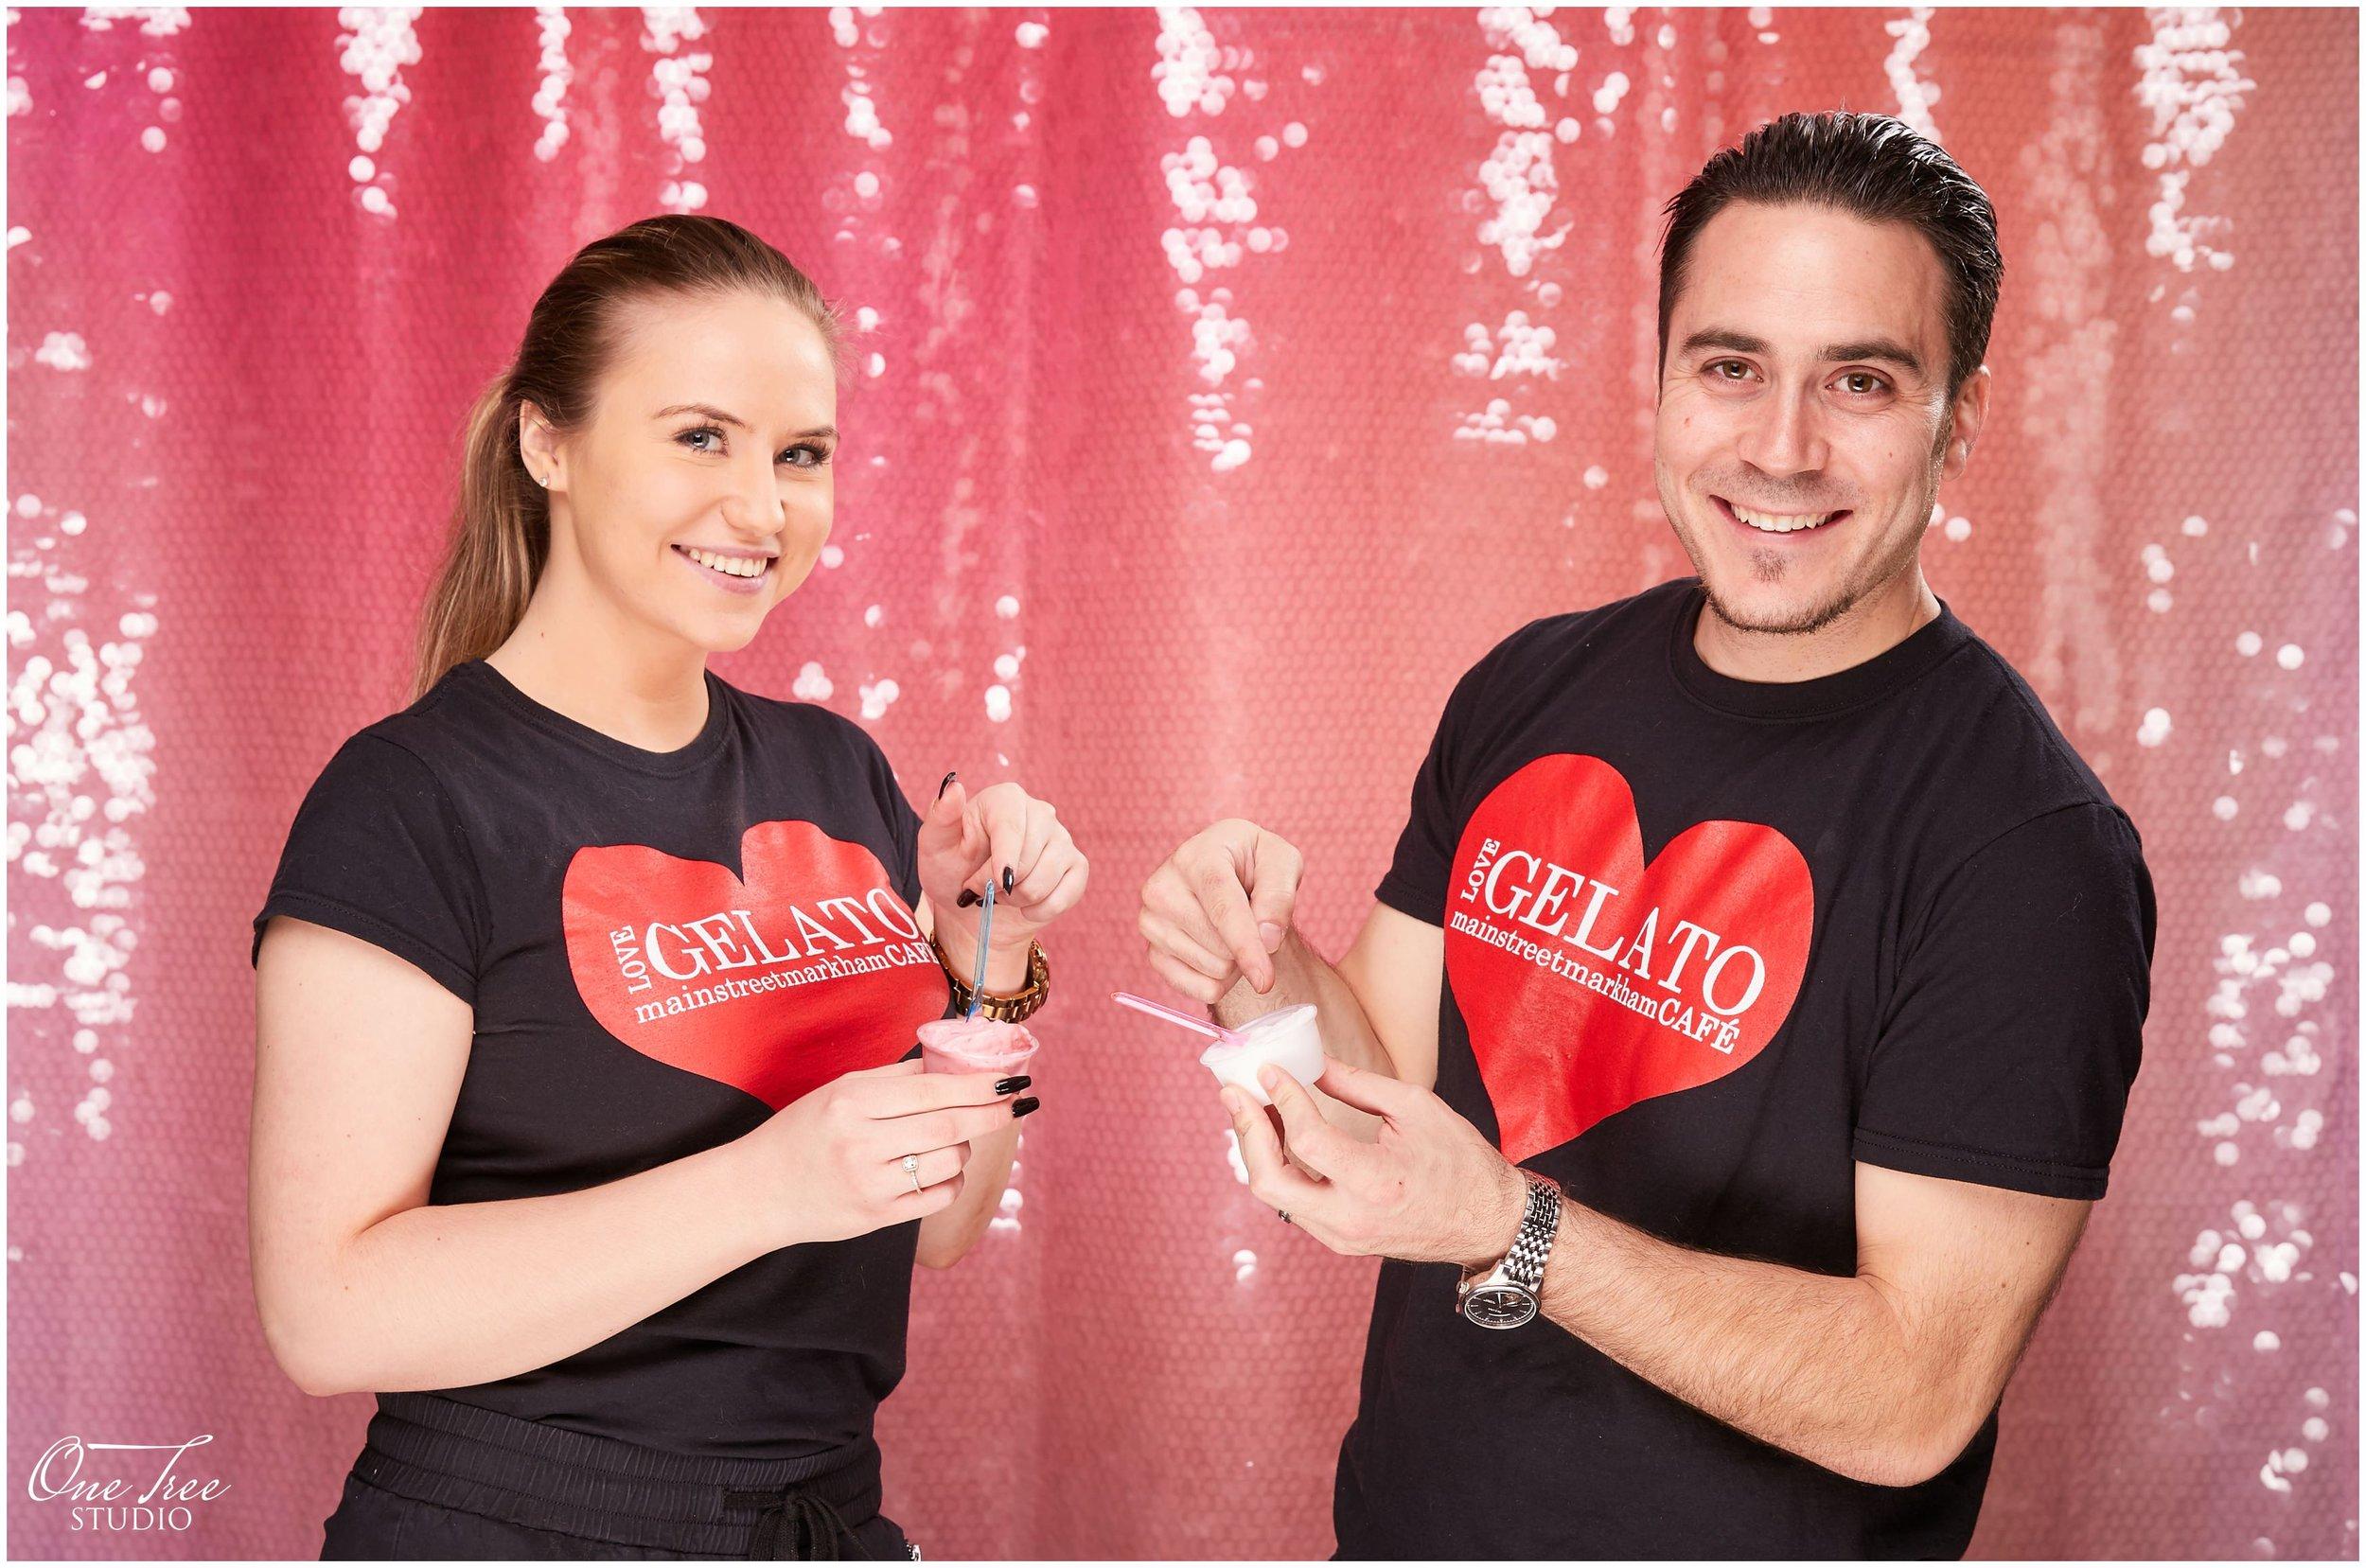 Love Gelato at Markham Stouffville Hospital's Portrait Photo Booth